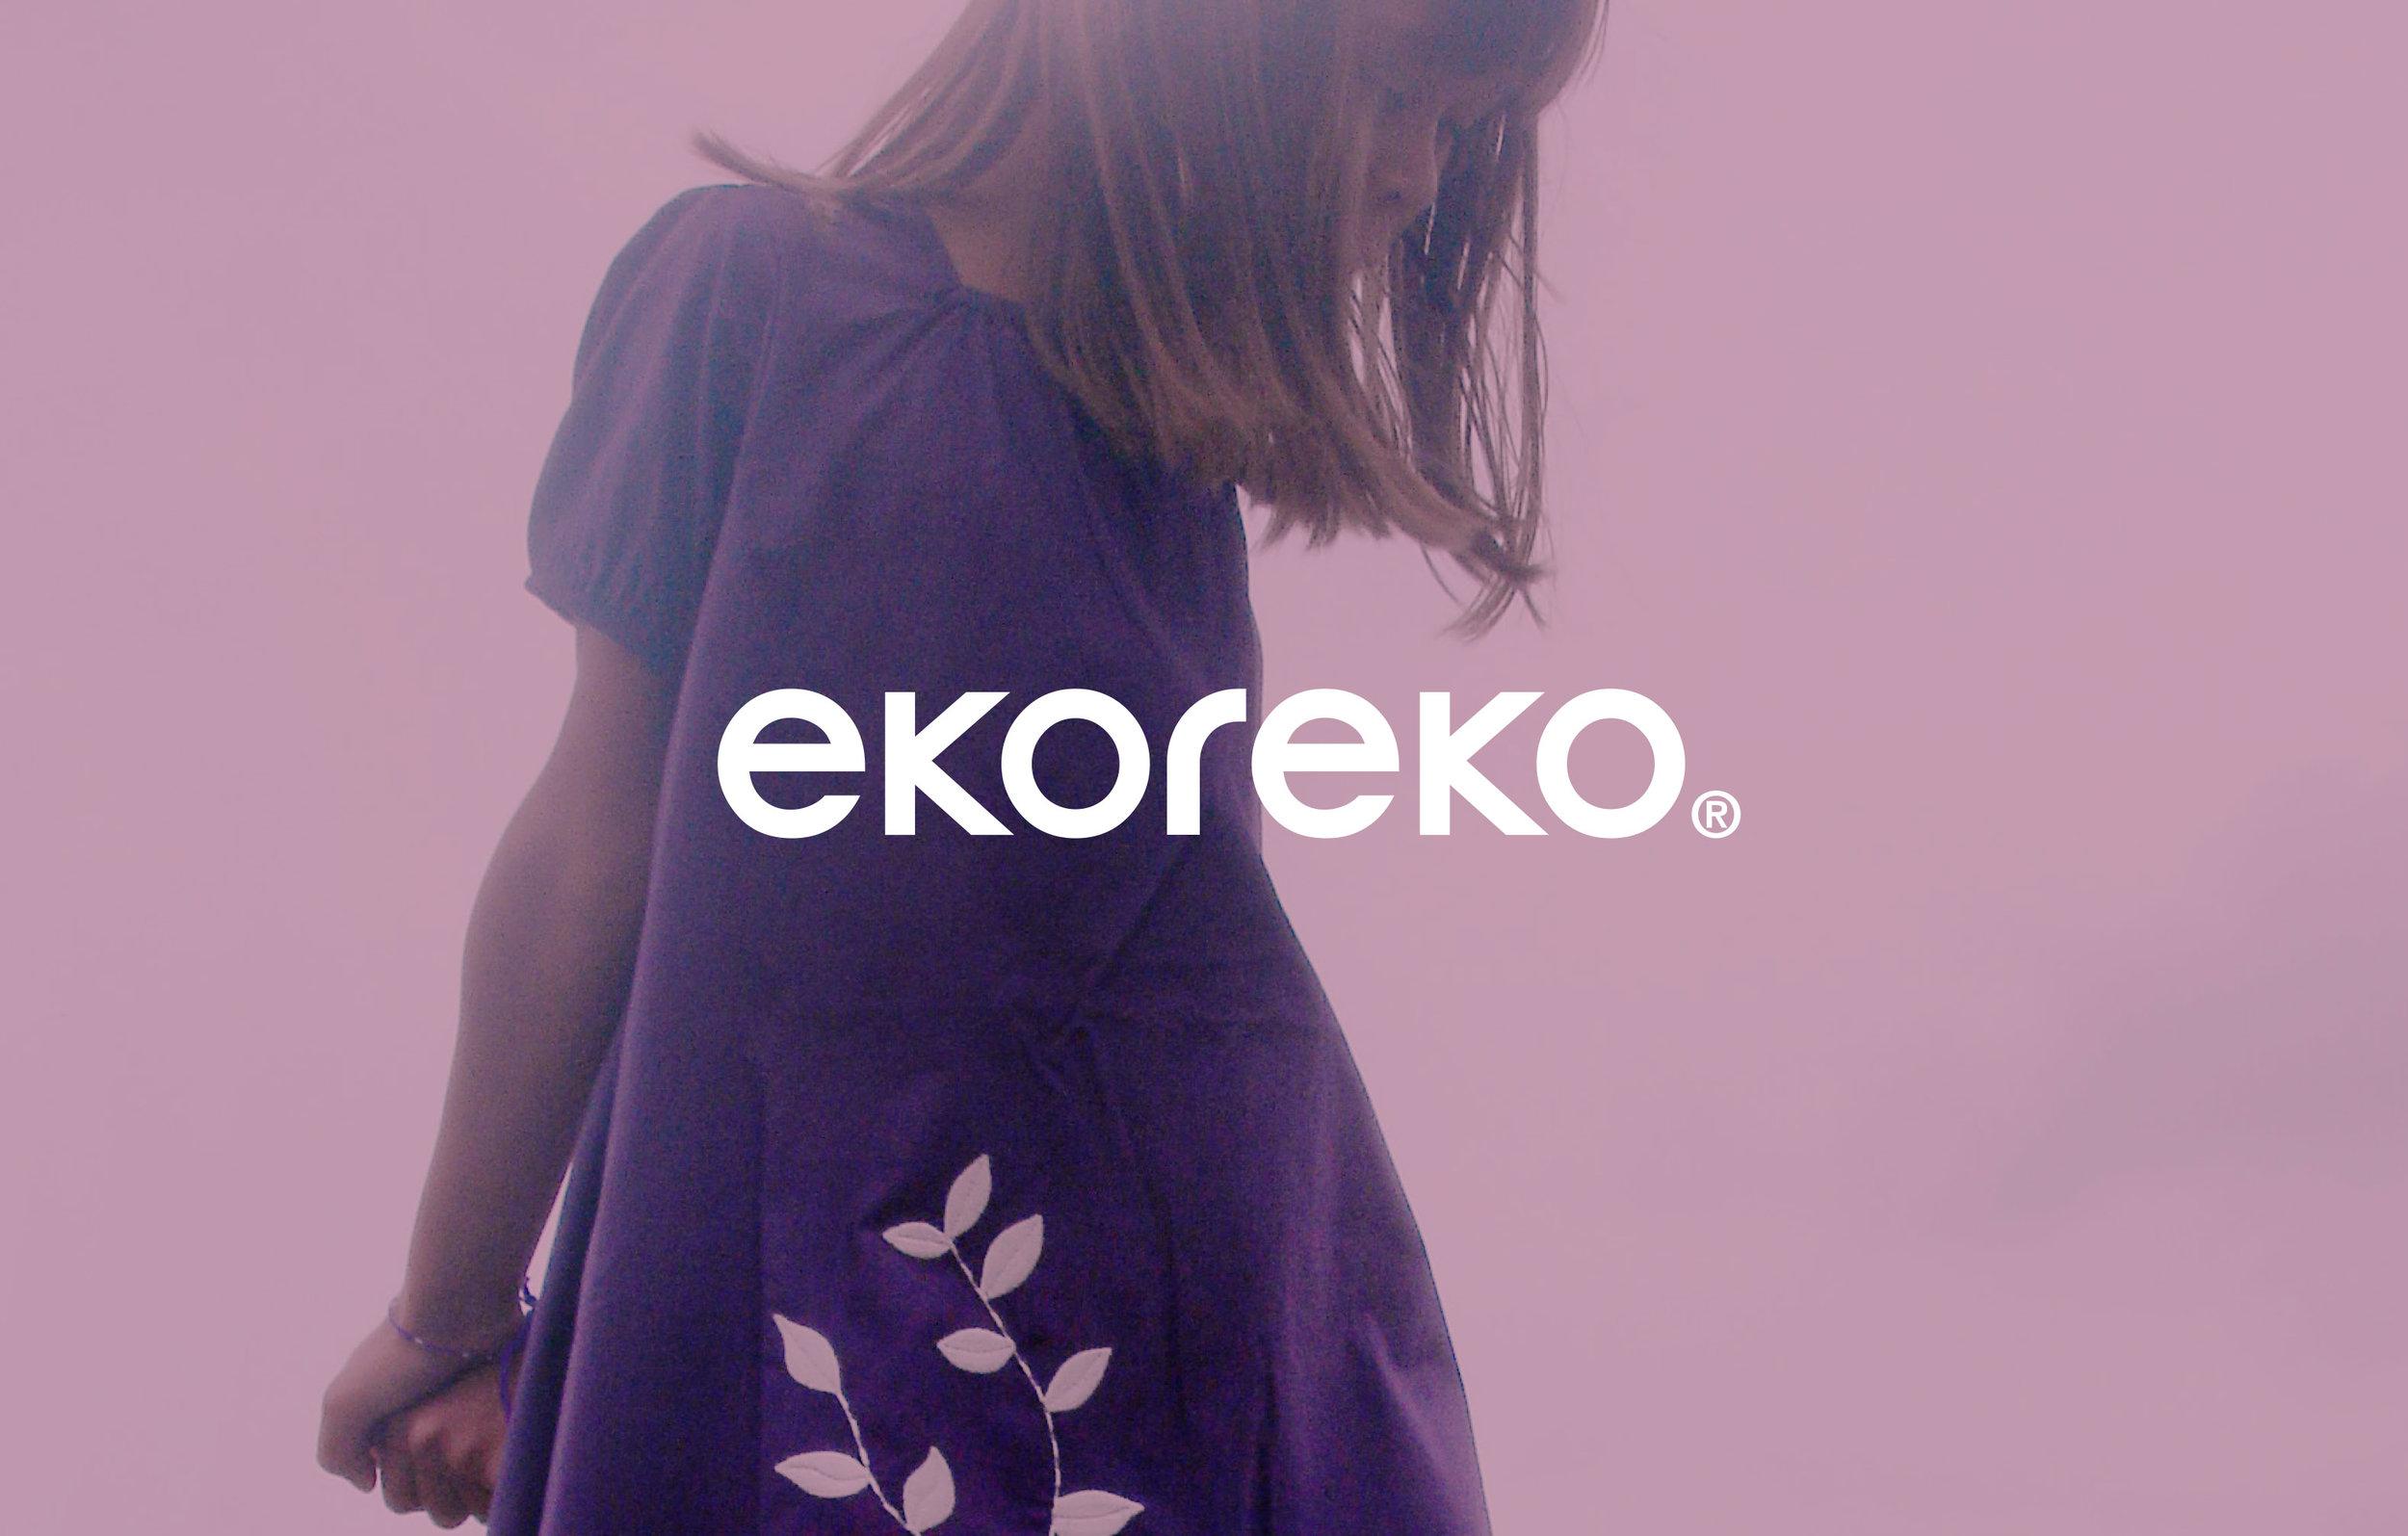 Ekoreko - brand identity, communication, webshop, tactical communication.